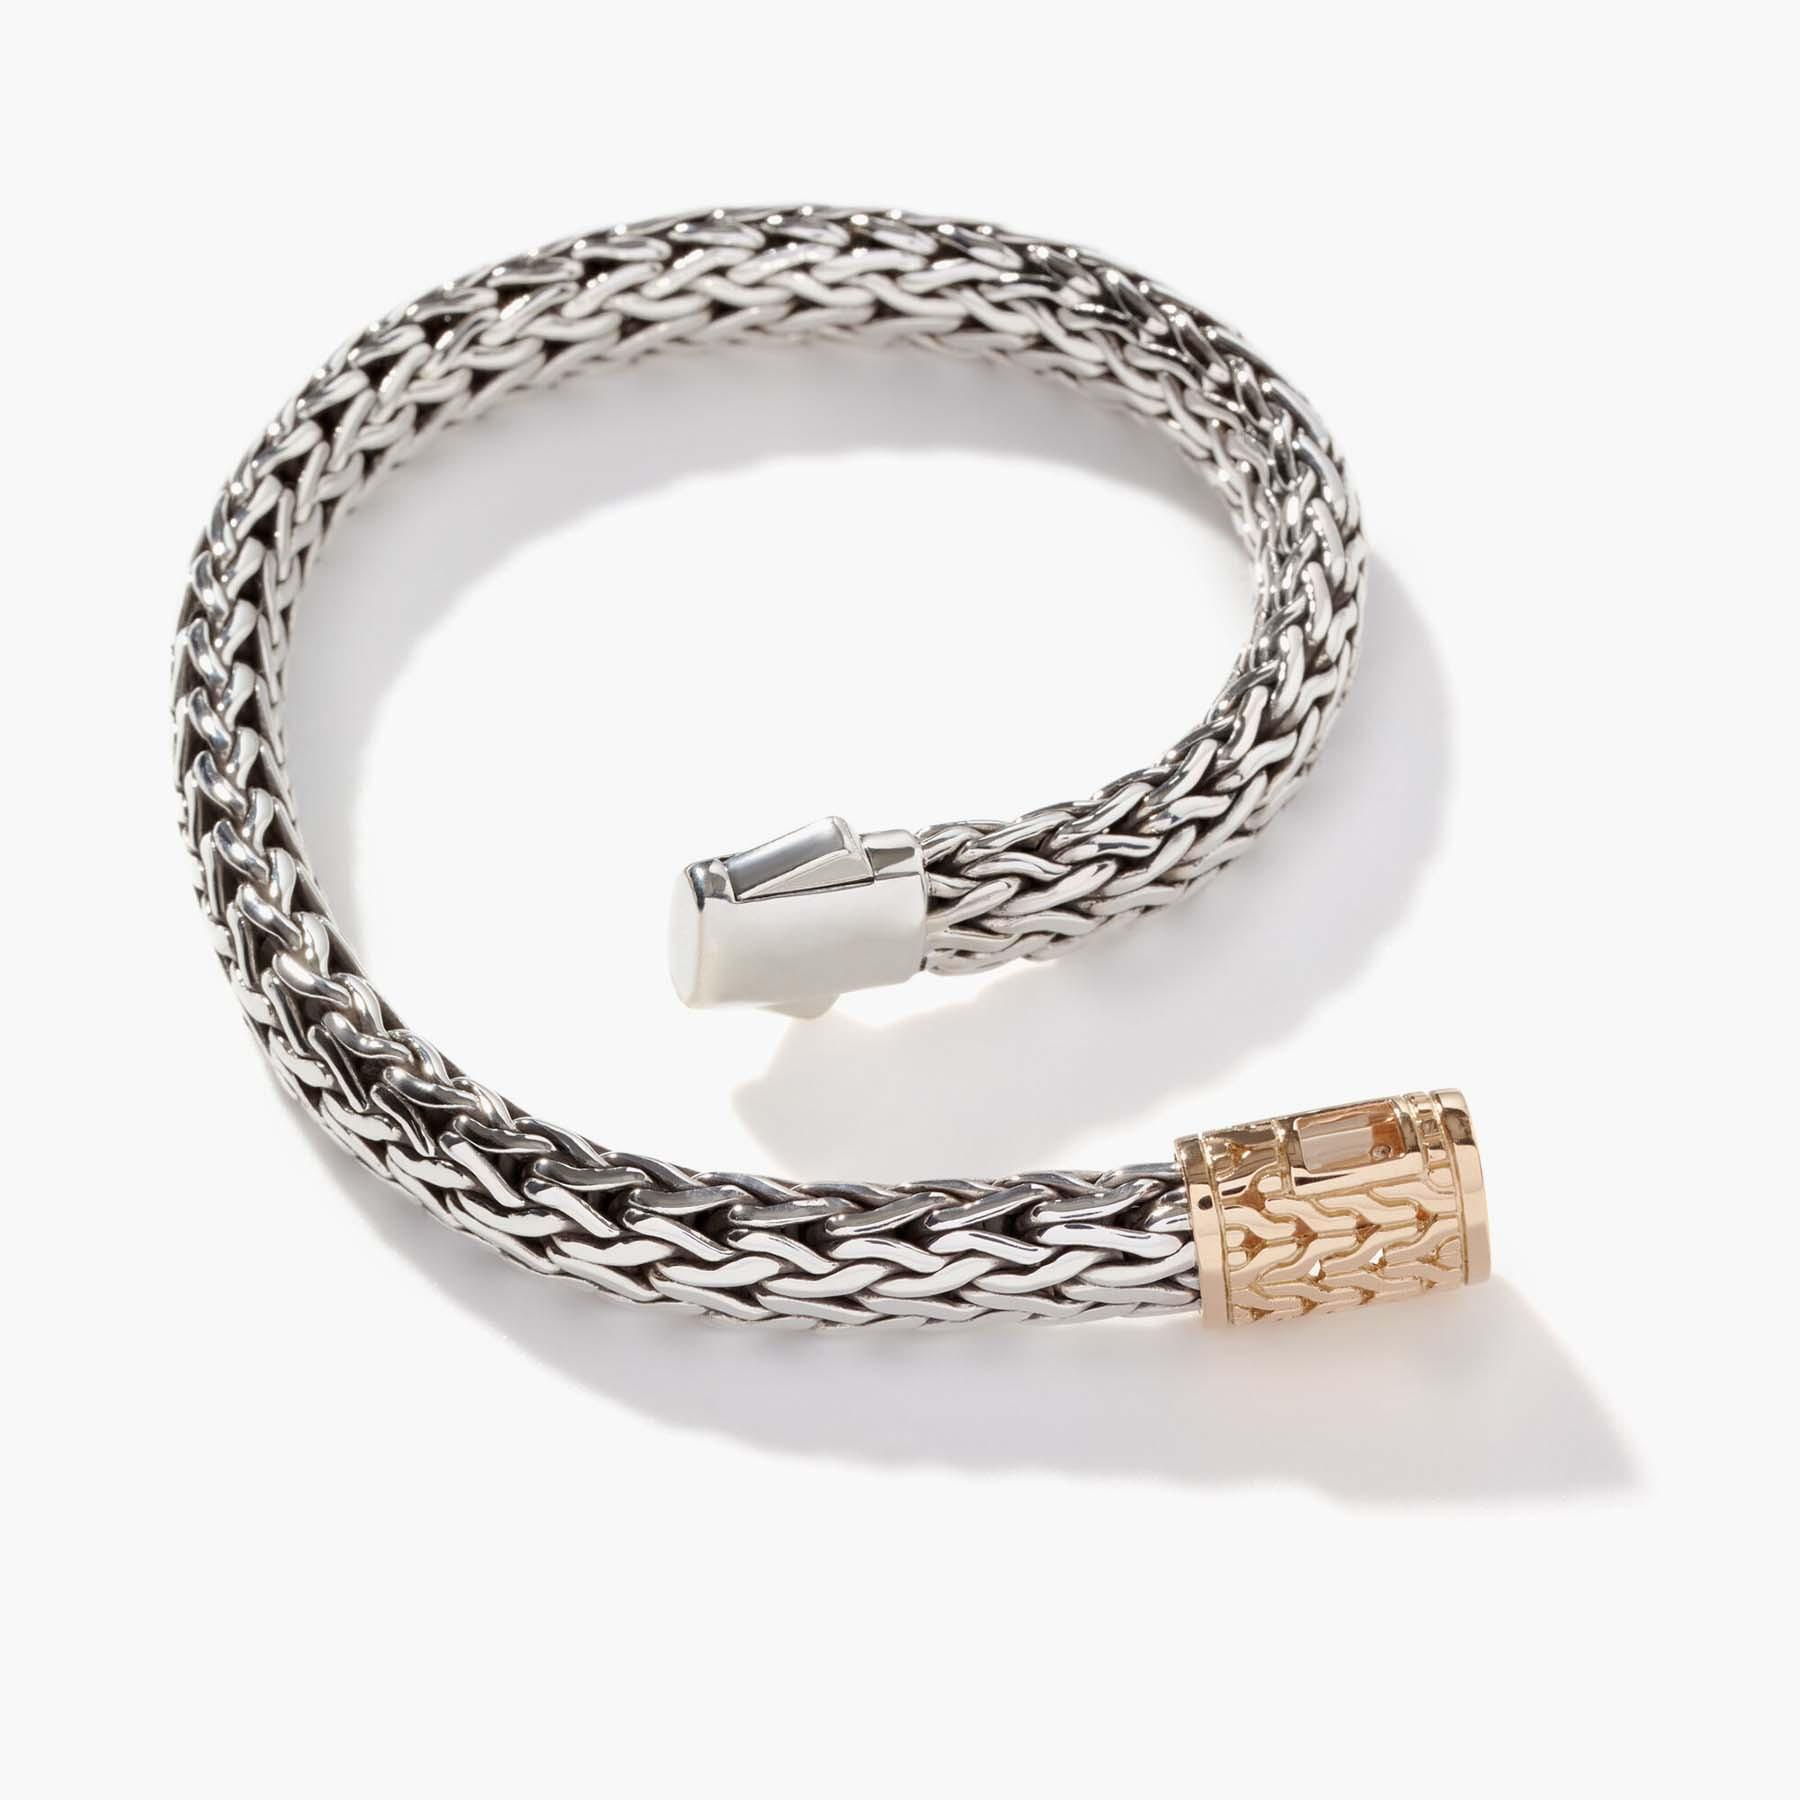 John Hardy Classic Chain Gold & Silver 7.5mm Large Bracelet